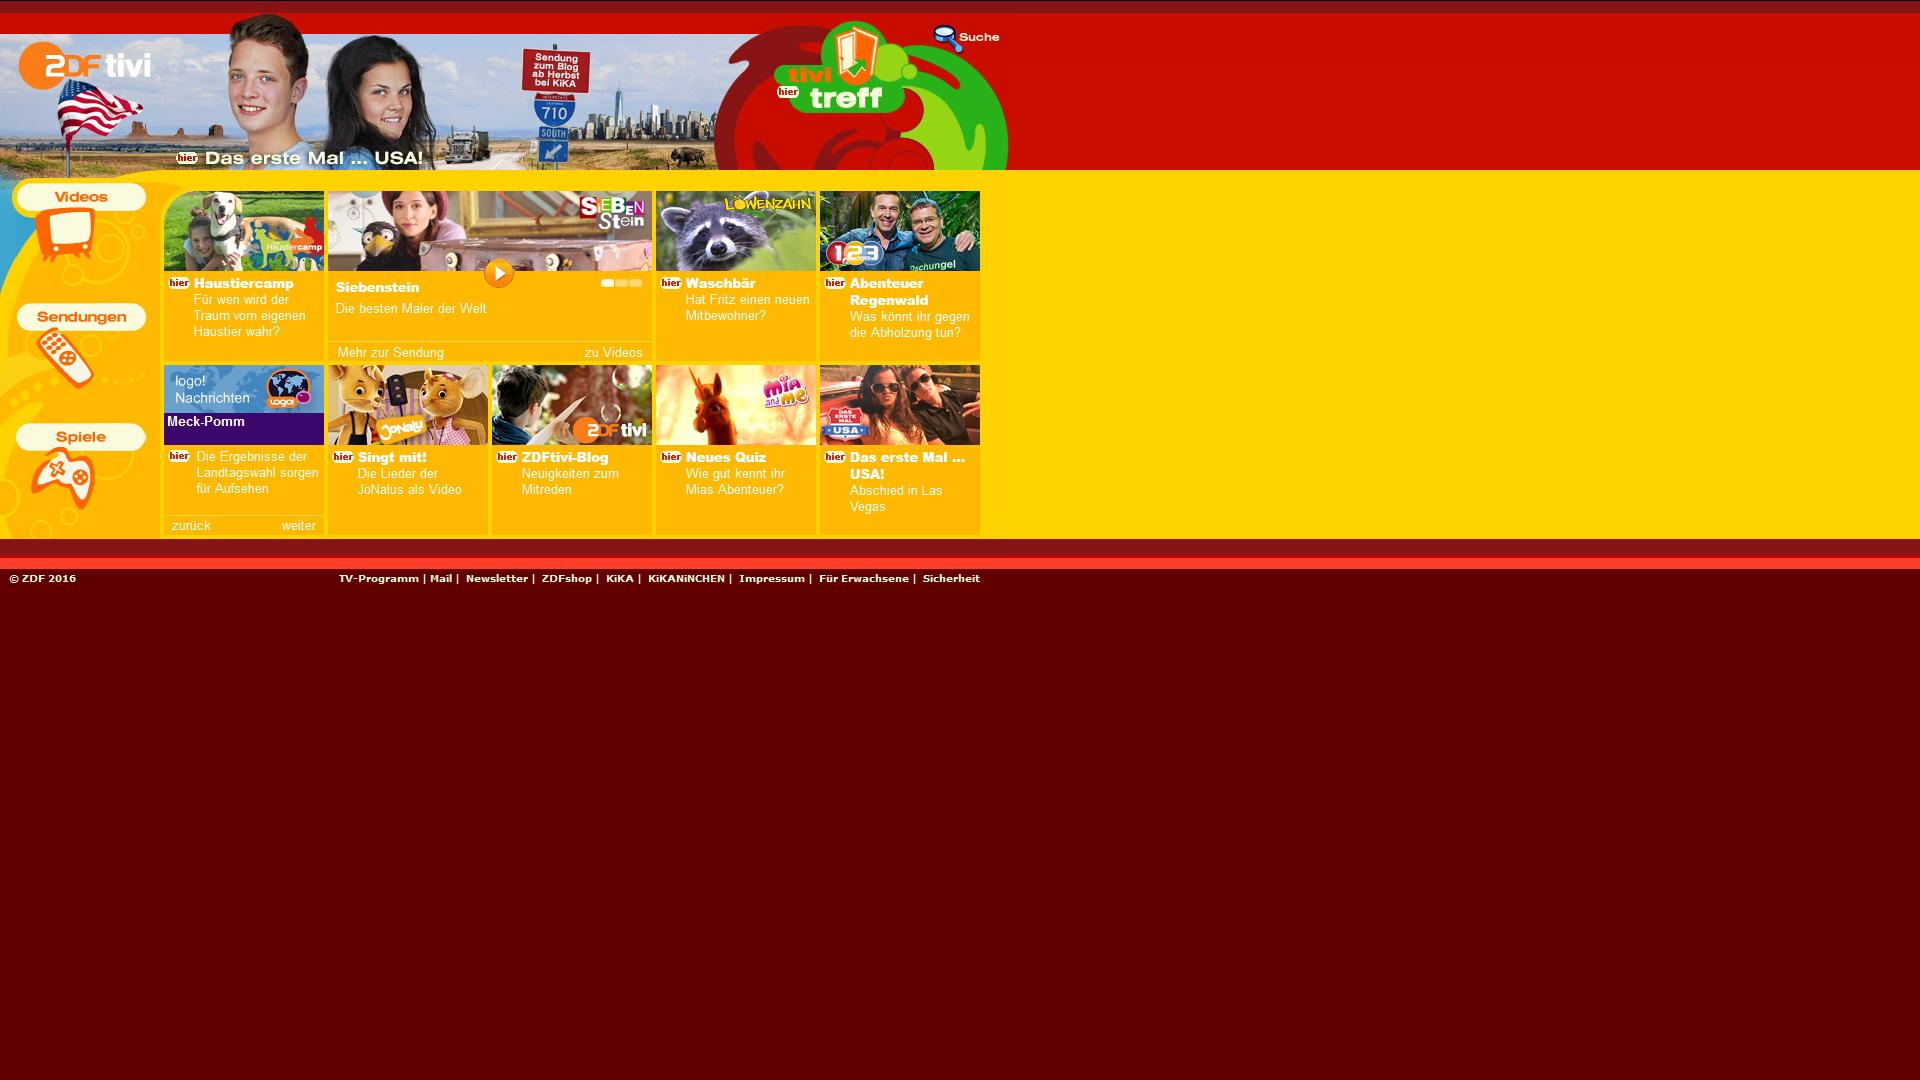 www.tivi.de